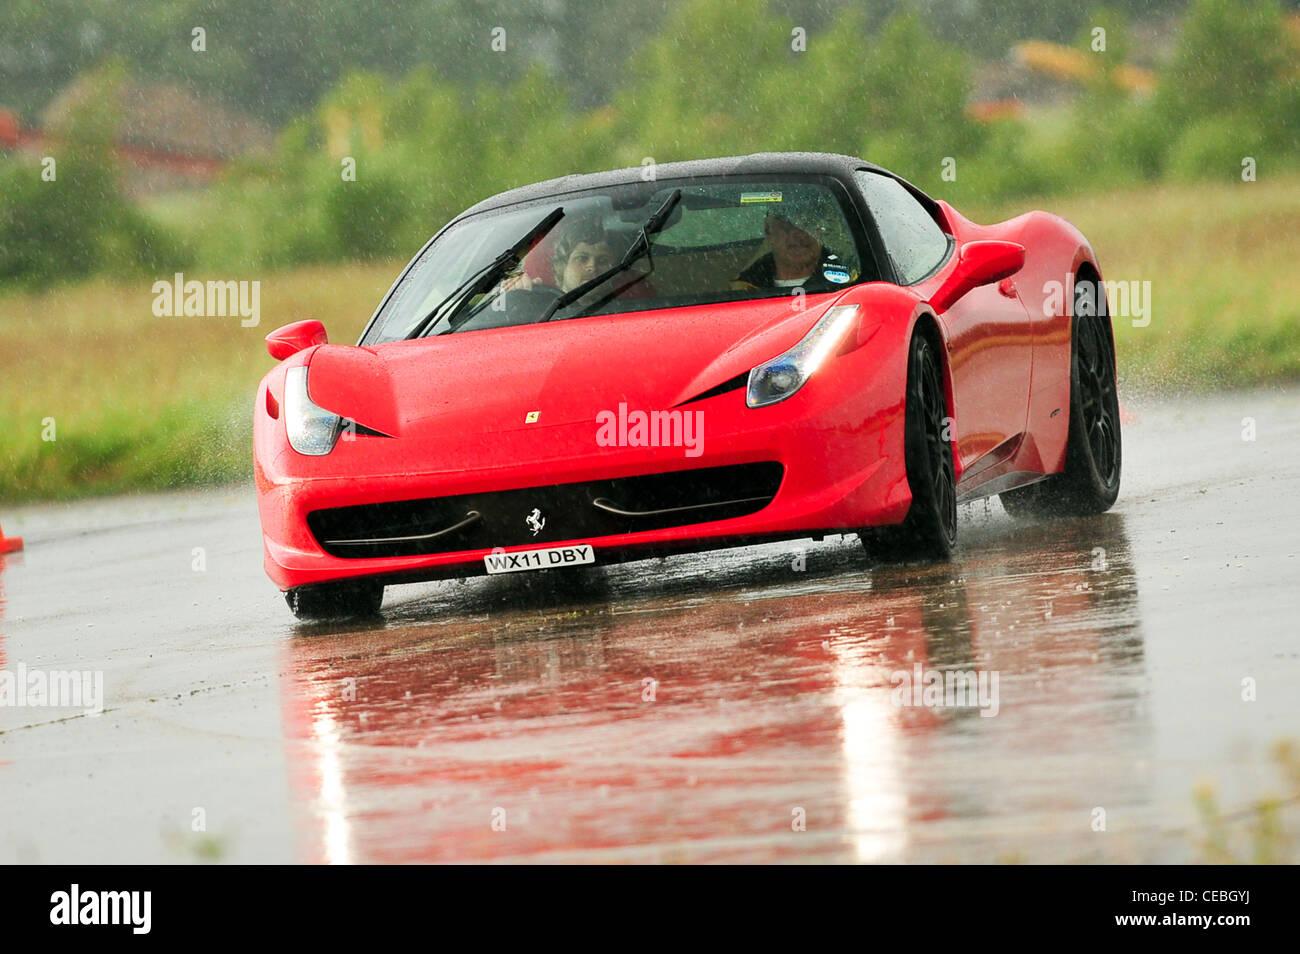 Supercars On Track Uk Ferrari 458 Italia Stock Photo Alamy